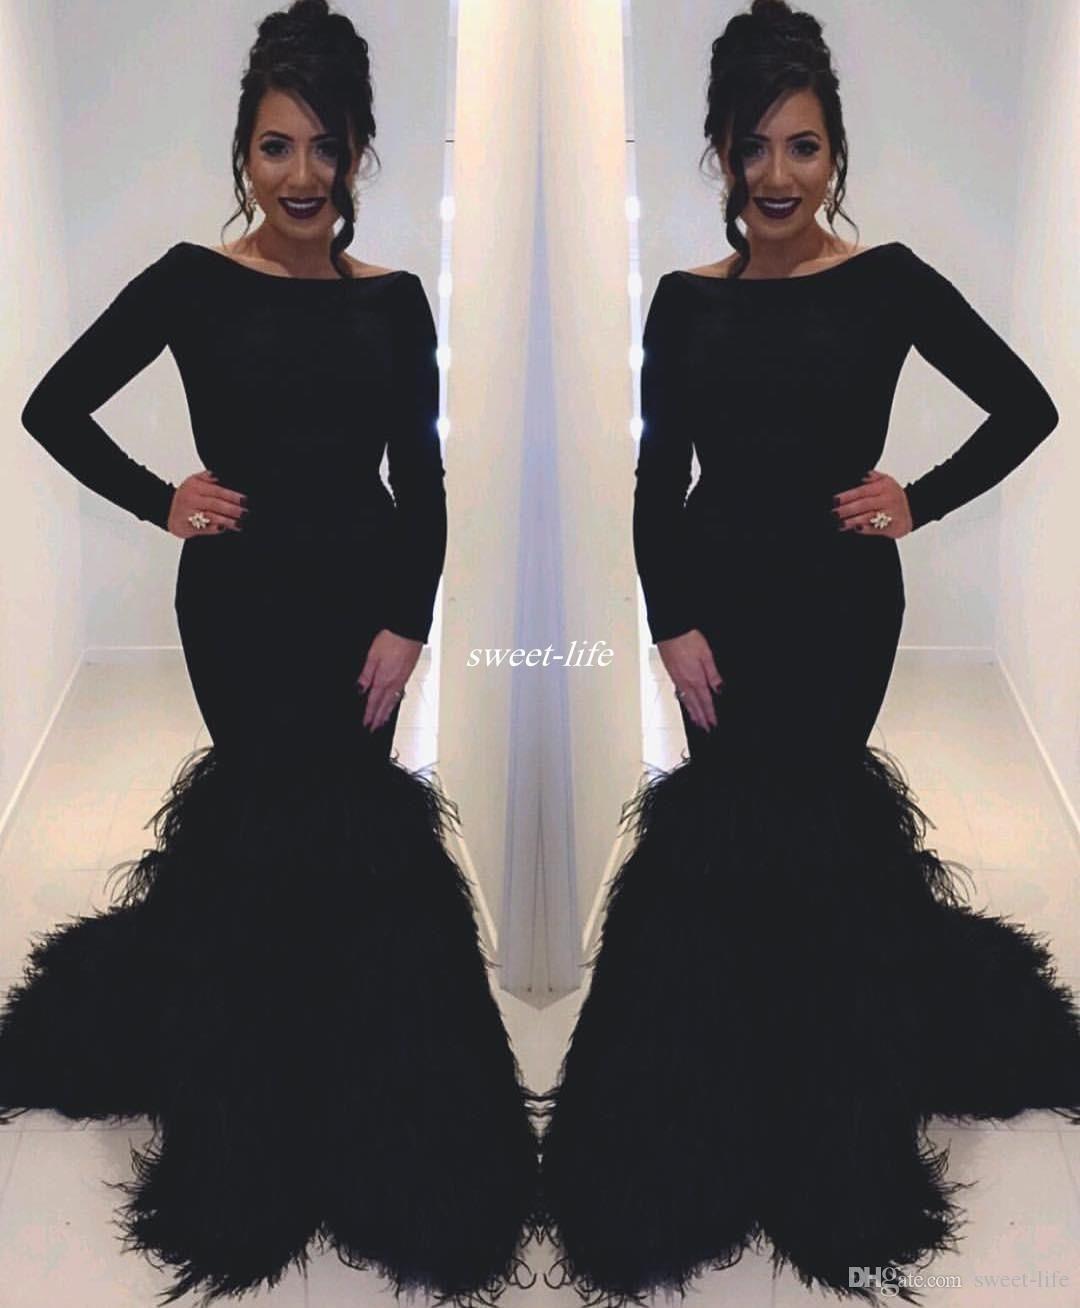 Black 2017 Long Sleeve Feather Evening Dresses Bateau Neck Mermaid Satin  with Train Zipper Celebrity Pageant a5d556508e40